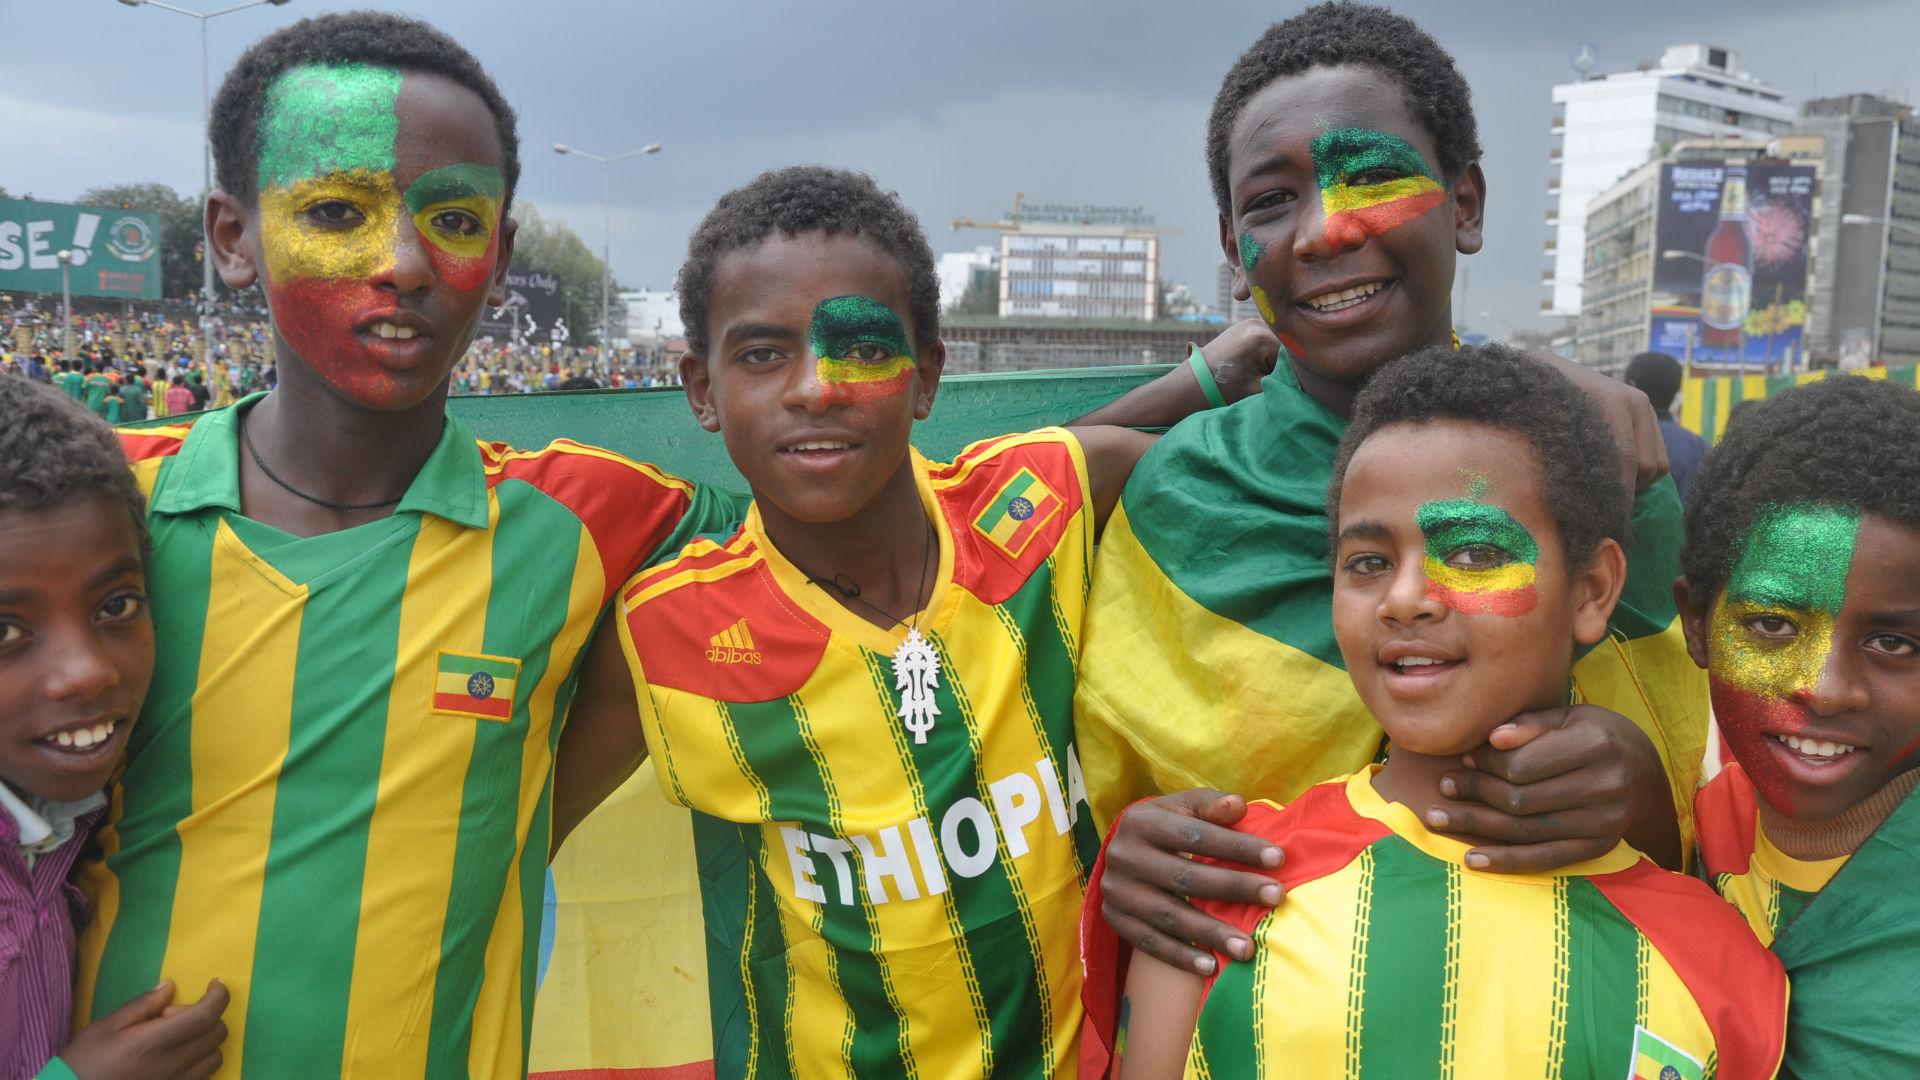 Ethiopia kids 20131013